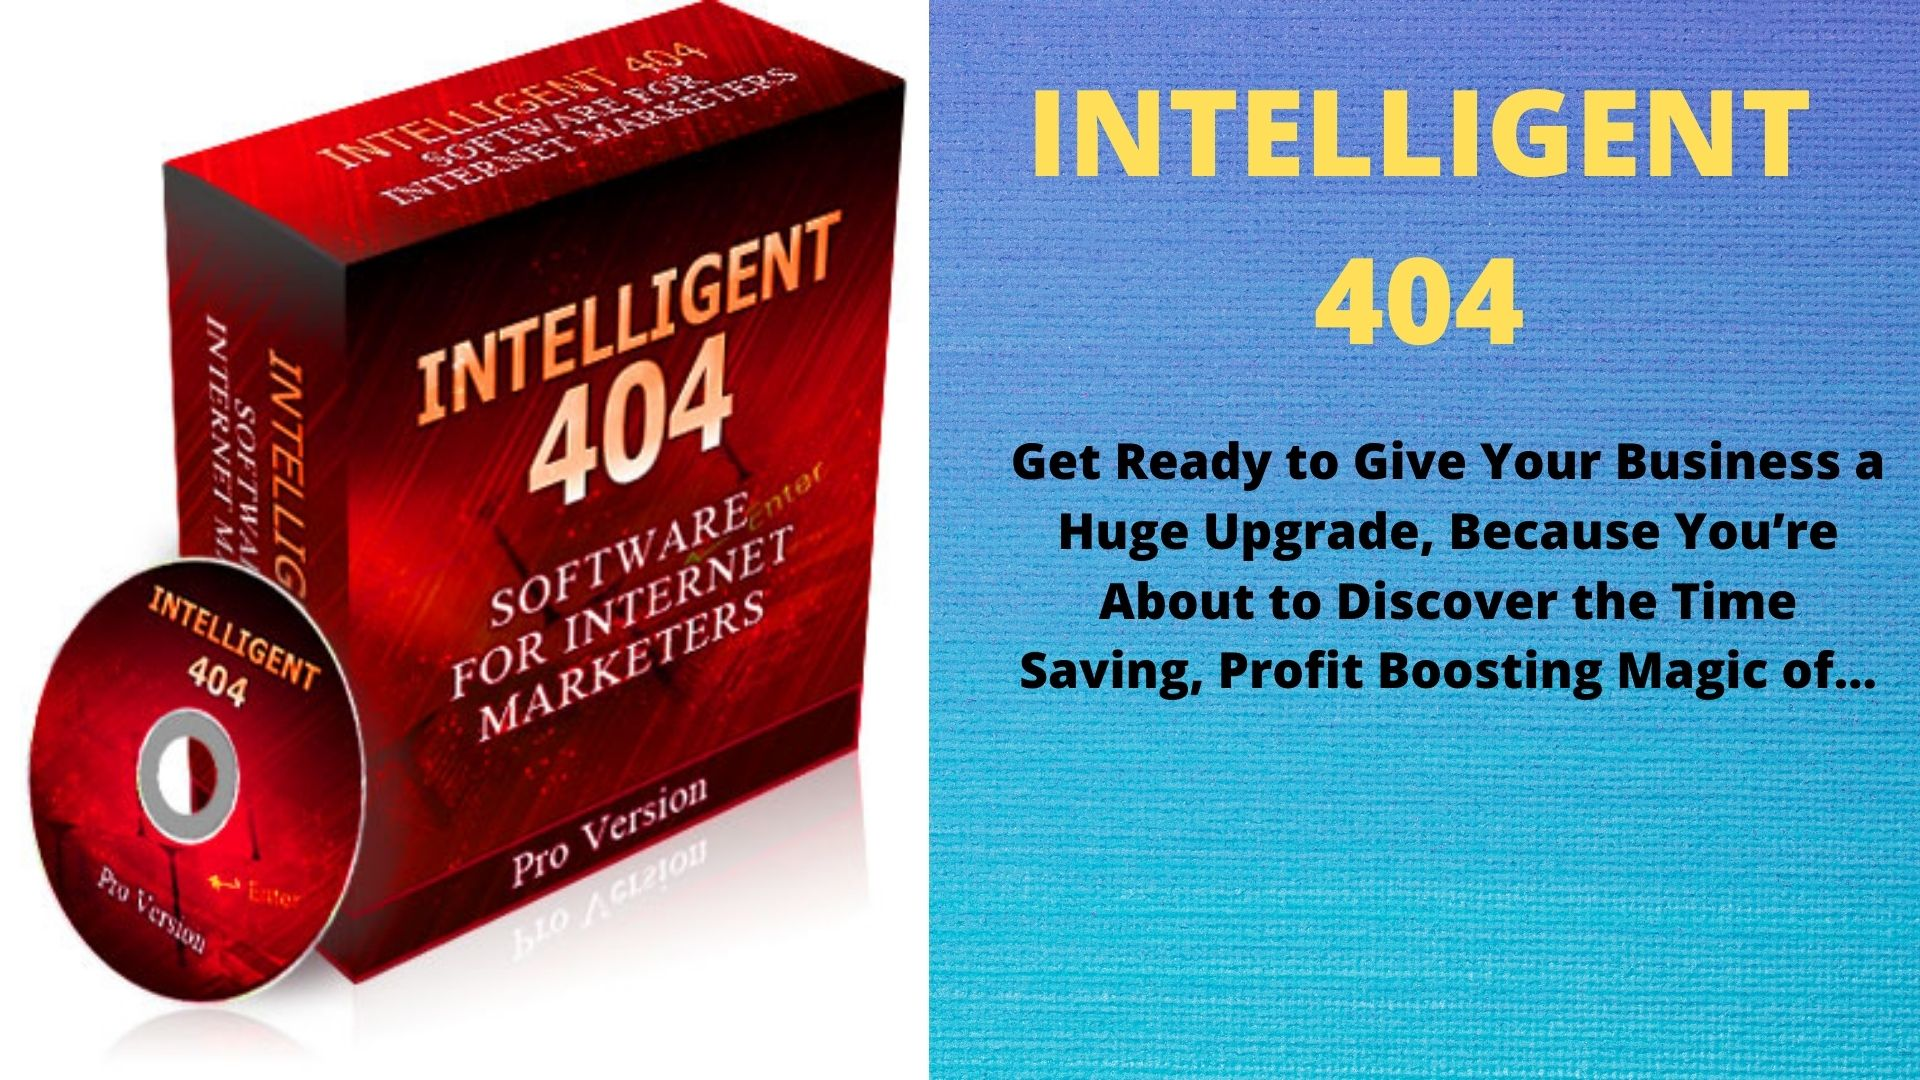 Intelligent 404 Software for Internet Marketers